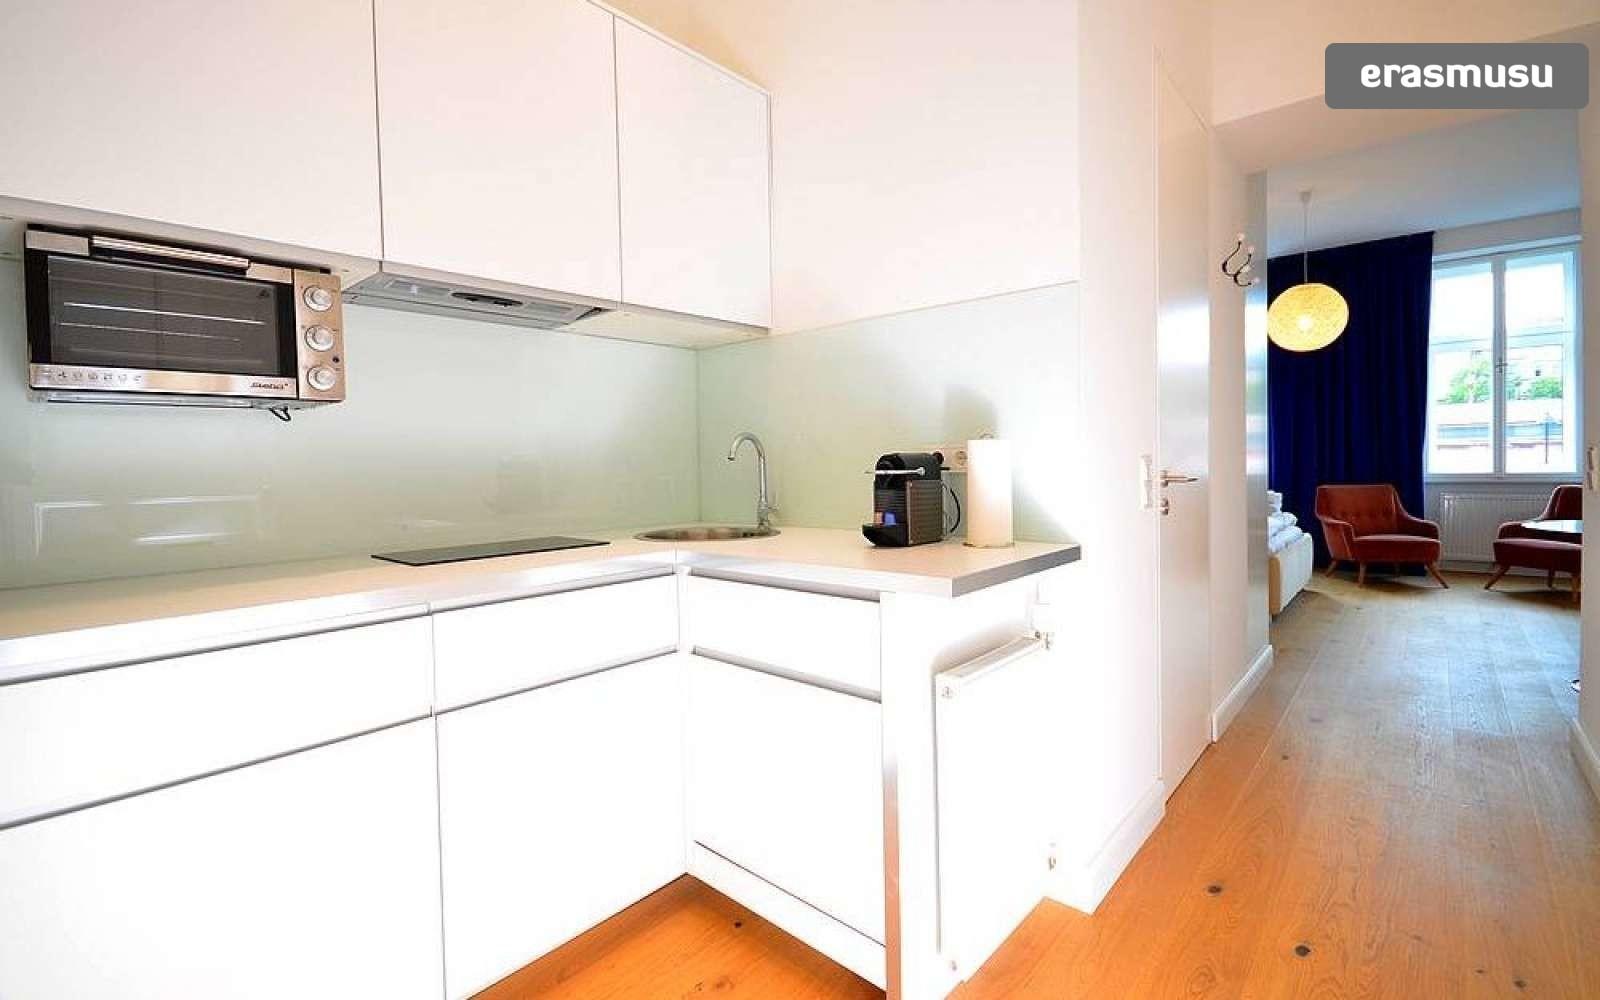 studio-apartment-rent-rudolfsheim-funfhaus-560cbdc23a8a60ff25165